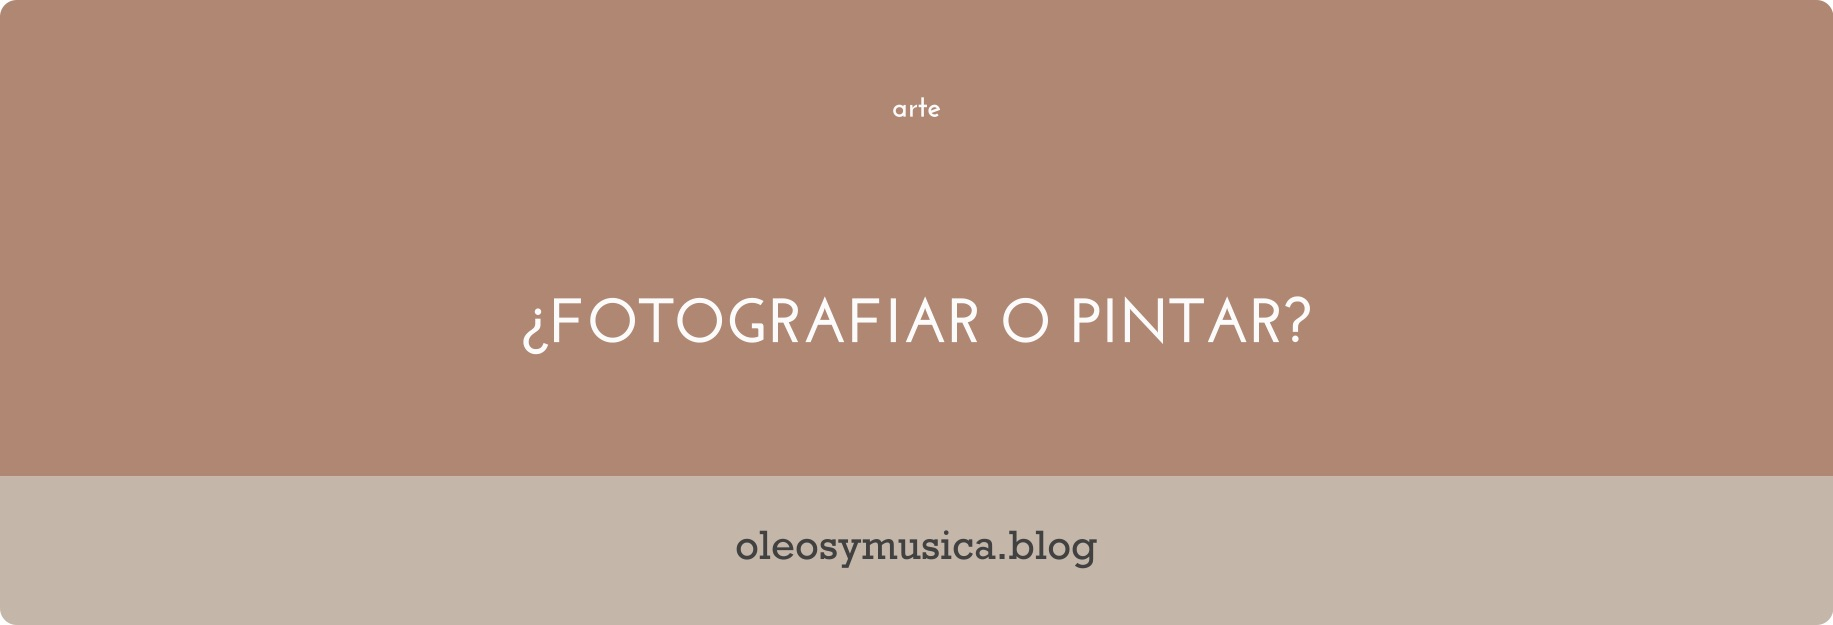 fotografiar o pintar - oleos y musica